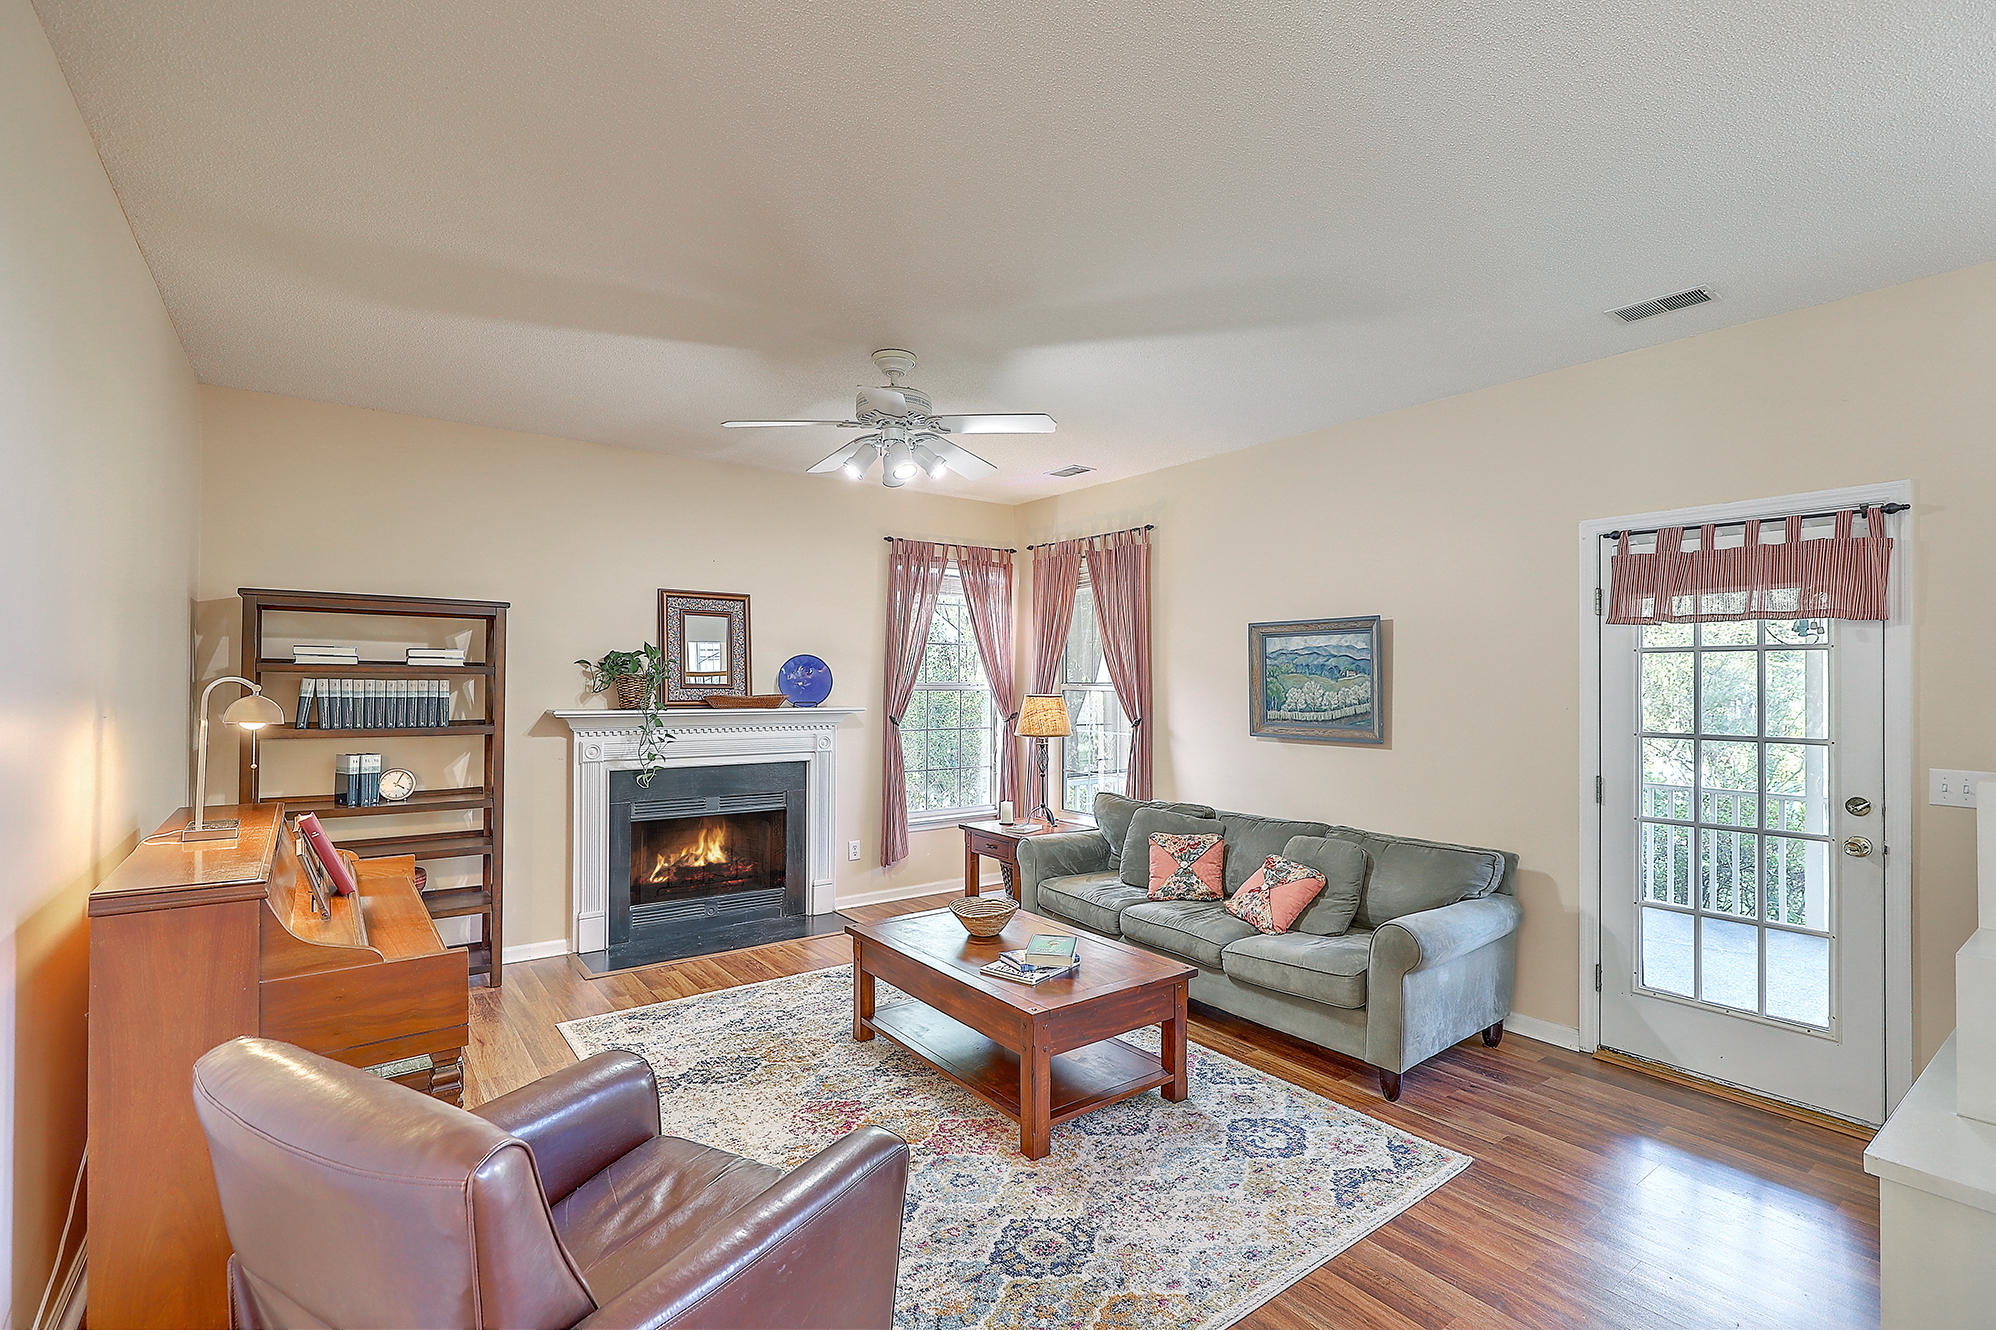 Belle Hall Homes For Sale - 106 Revolution, Mount Pleasant, SC - 46